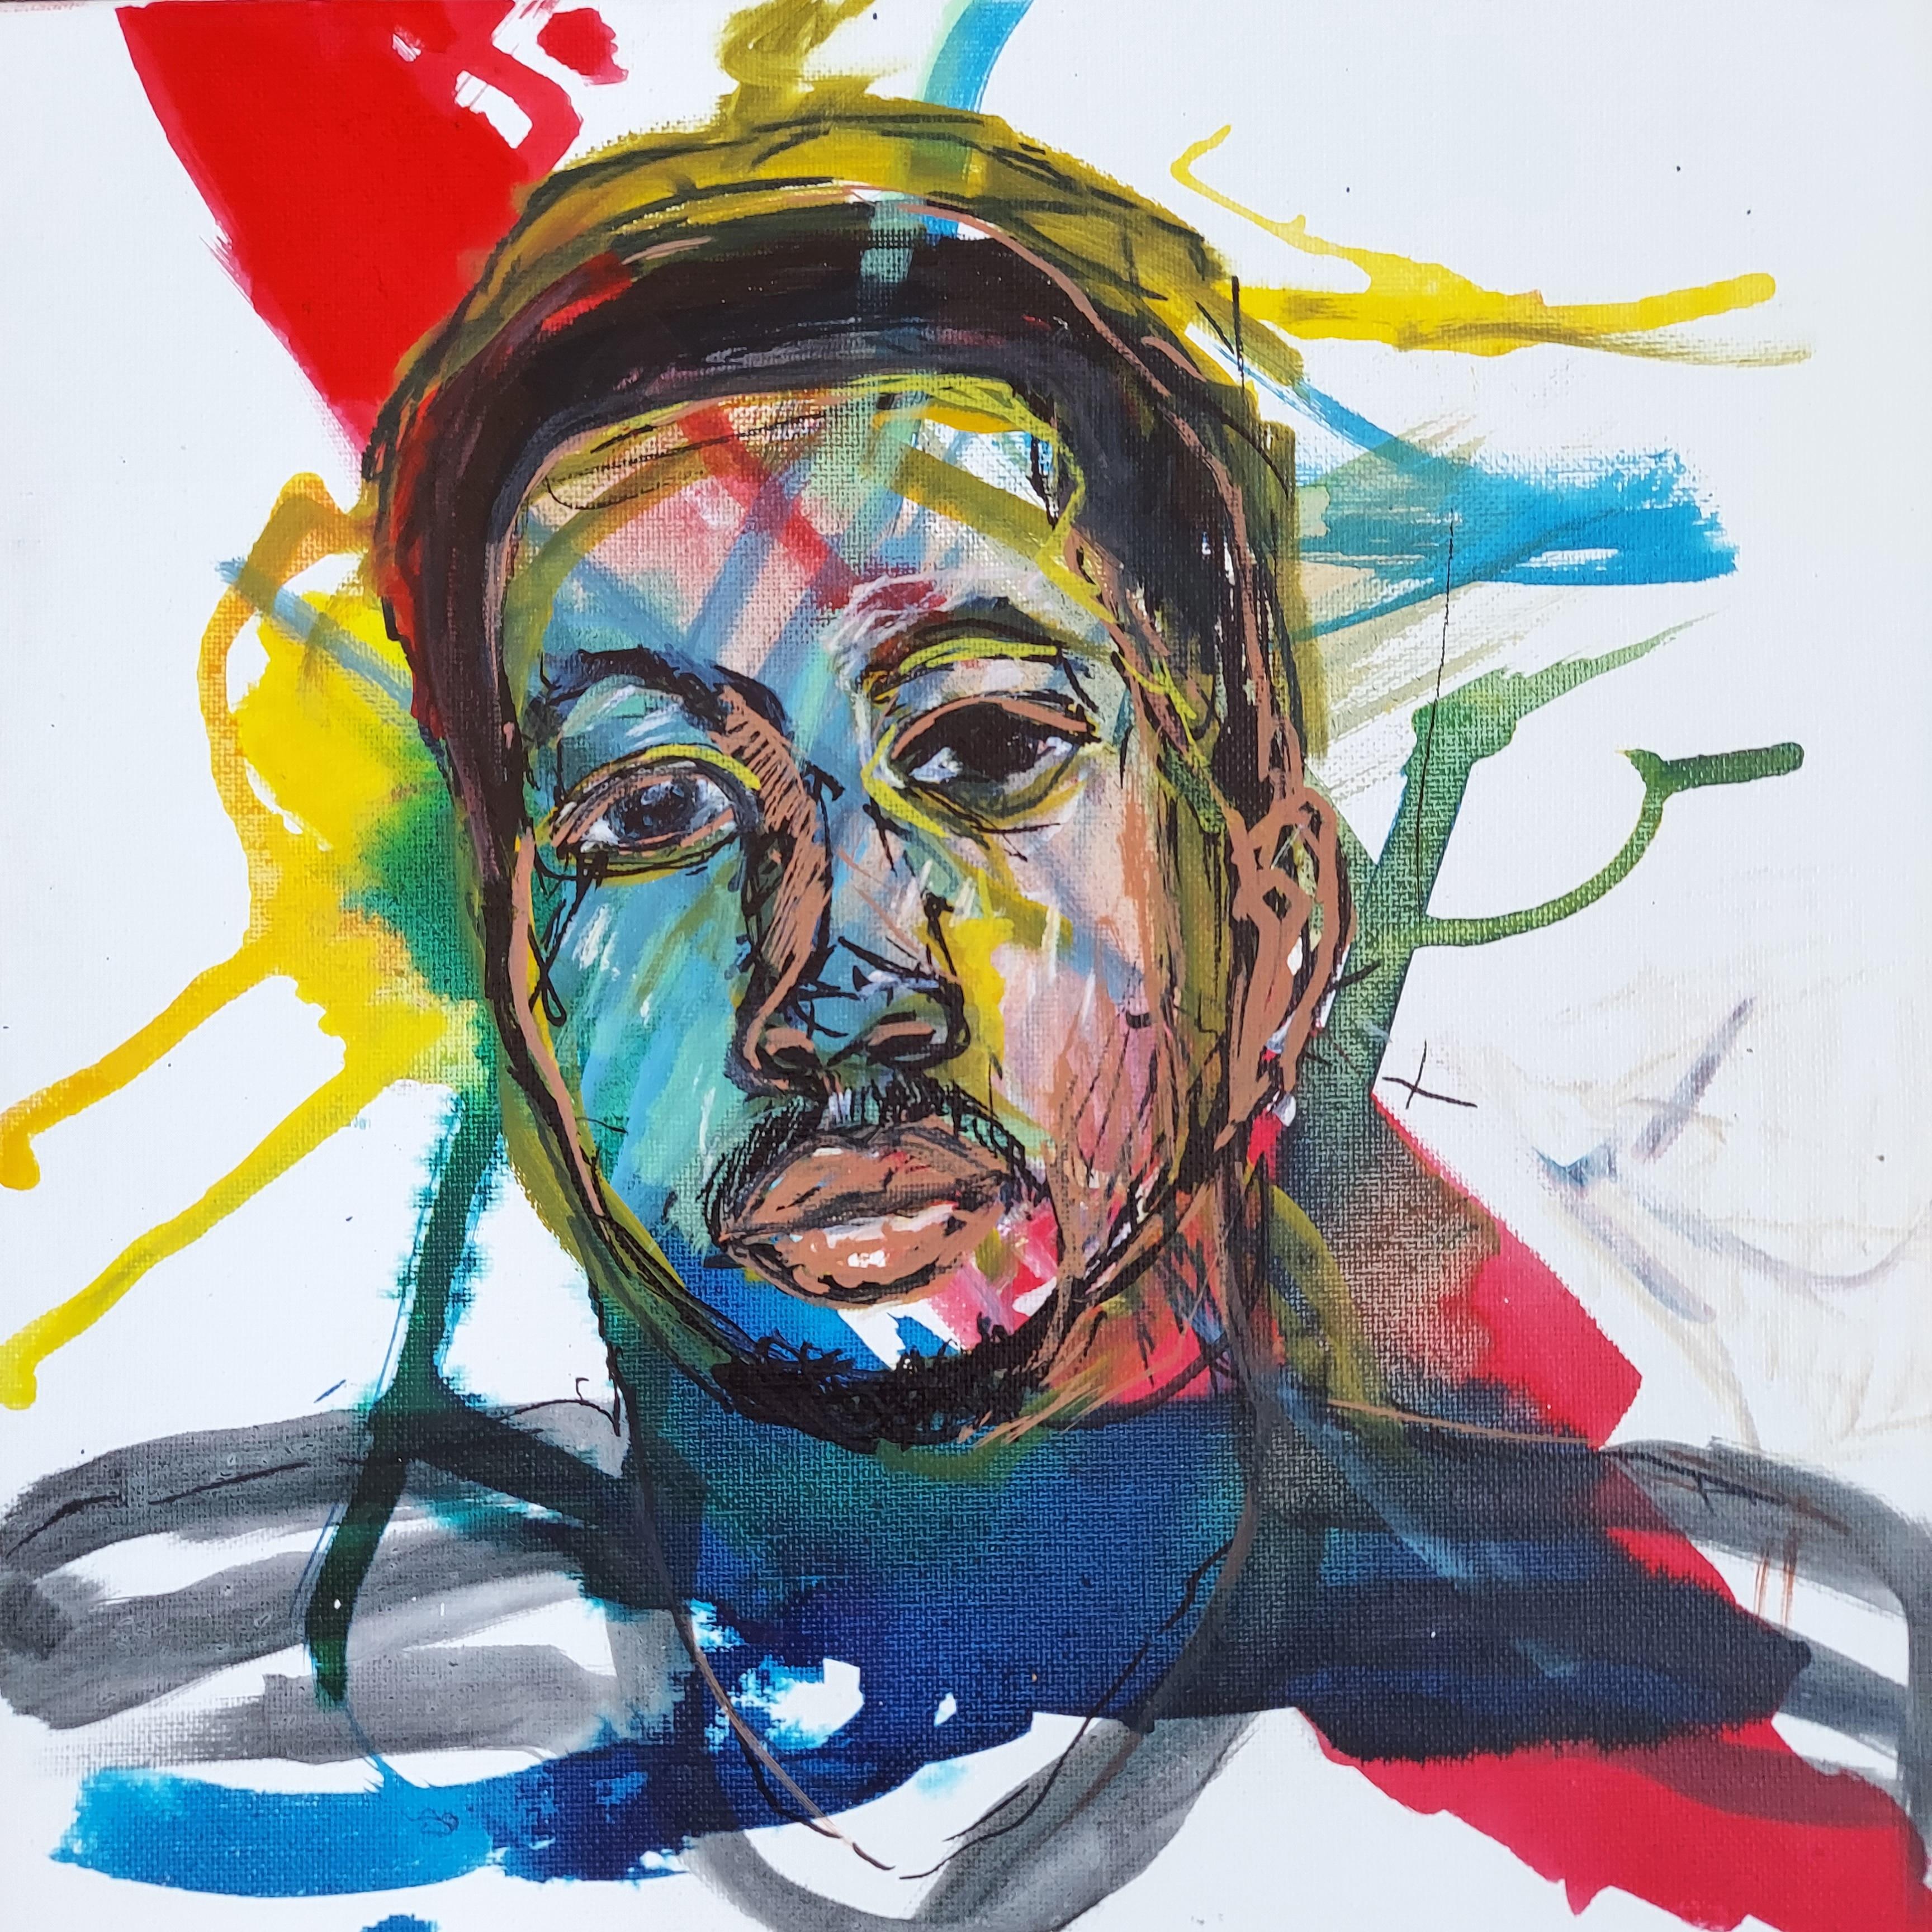 Chad (2020)